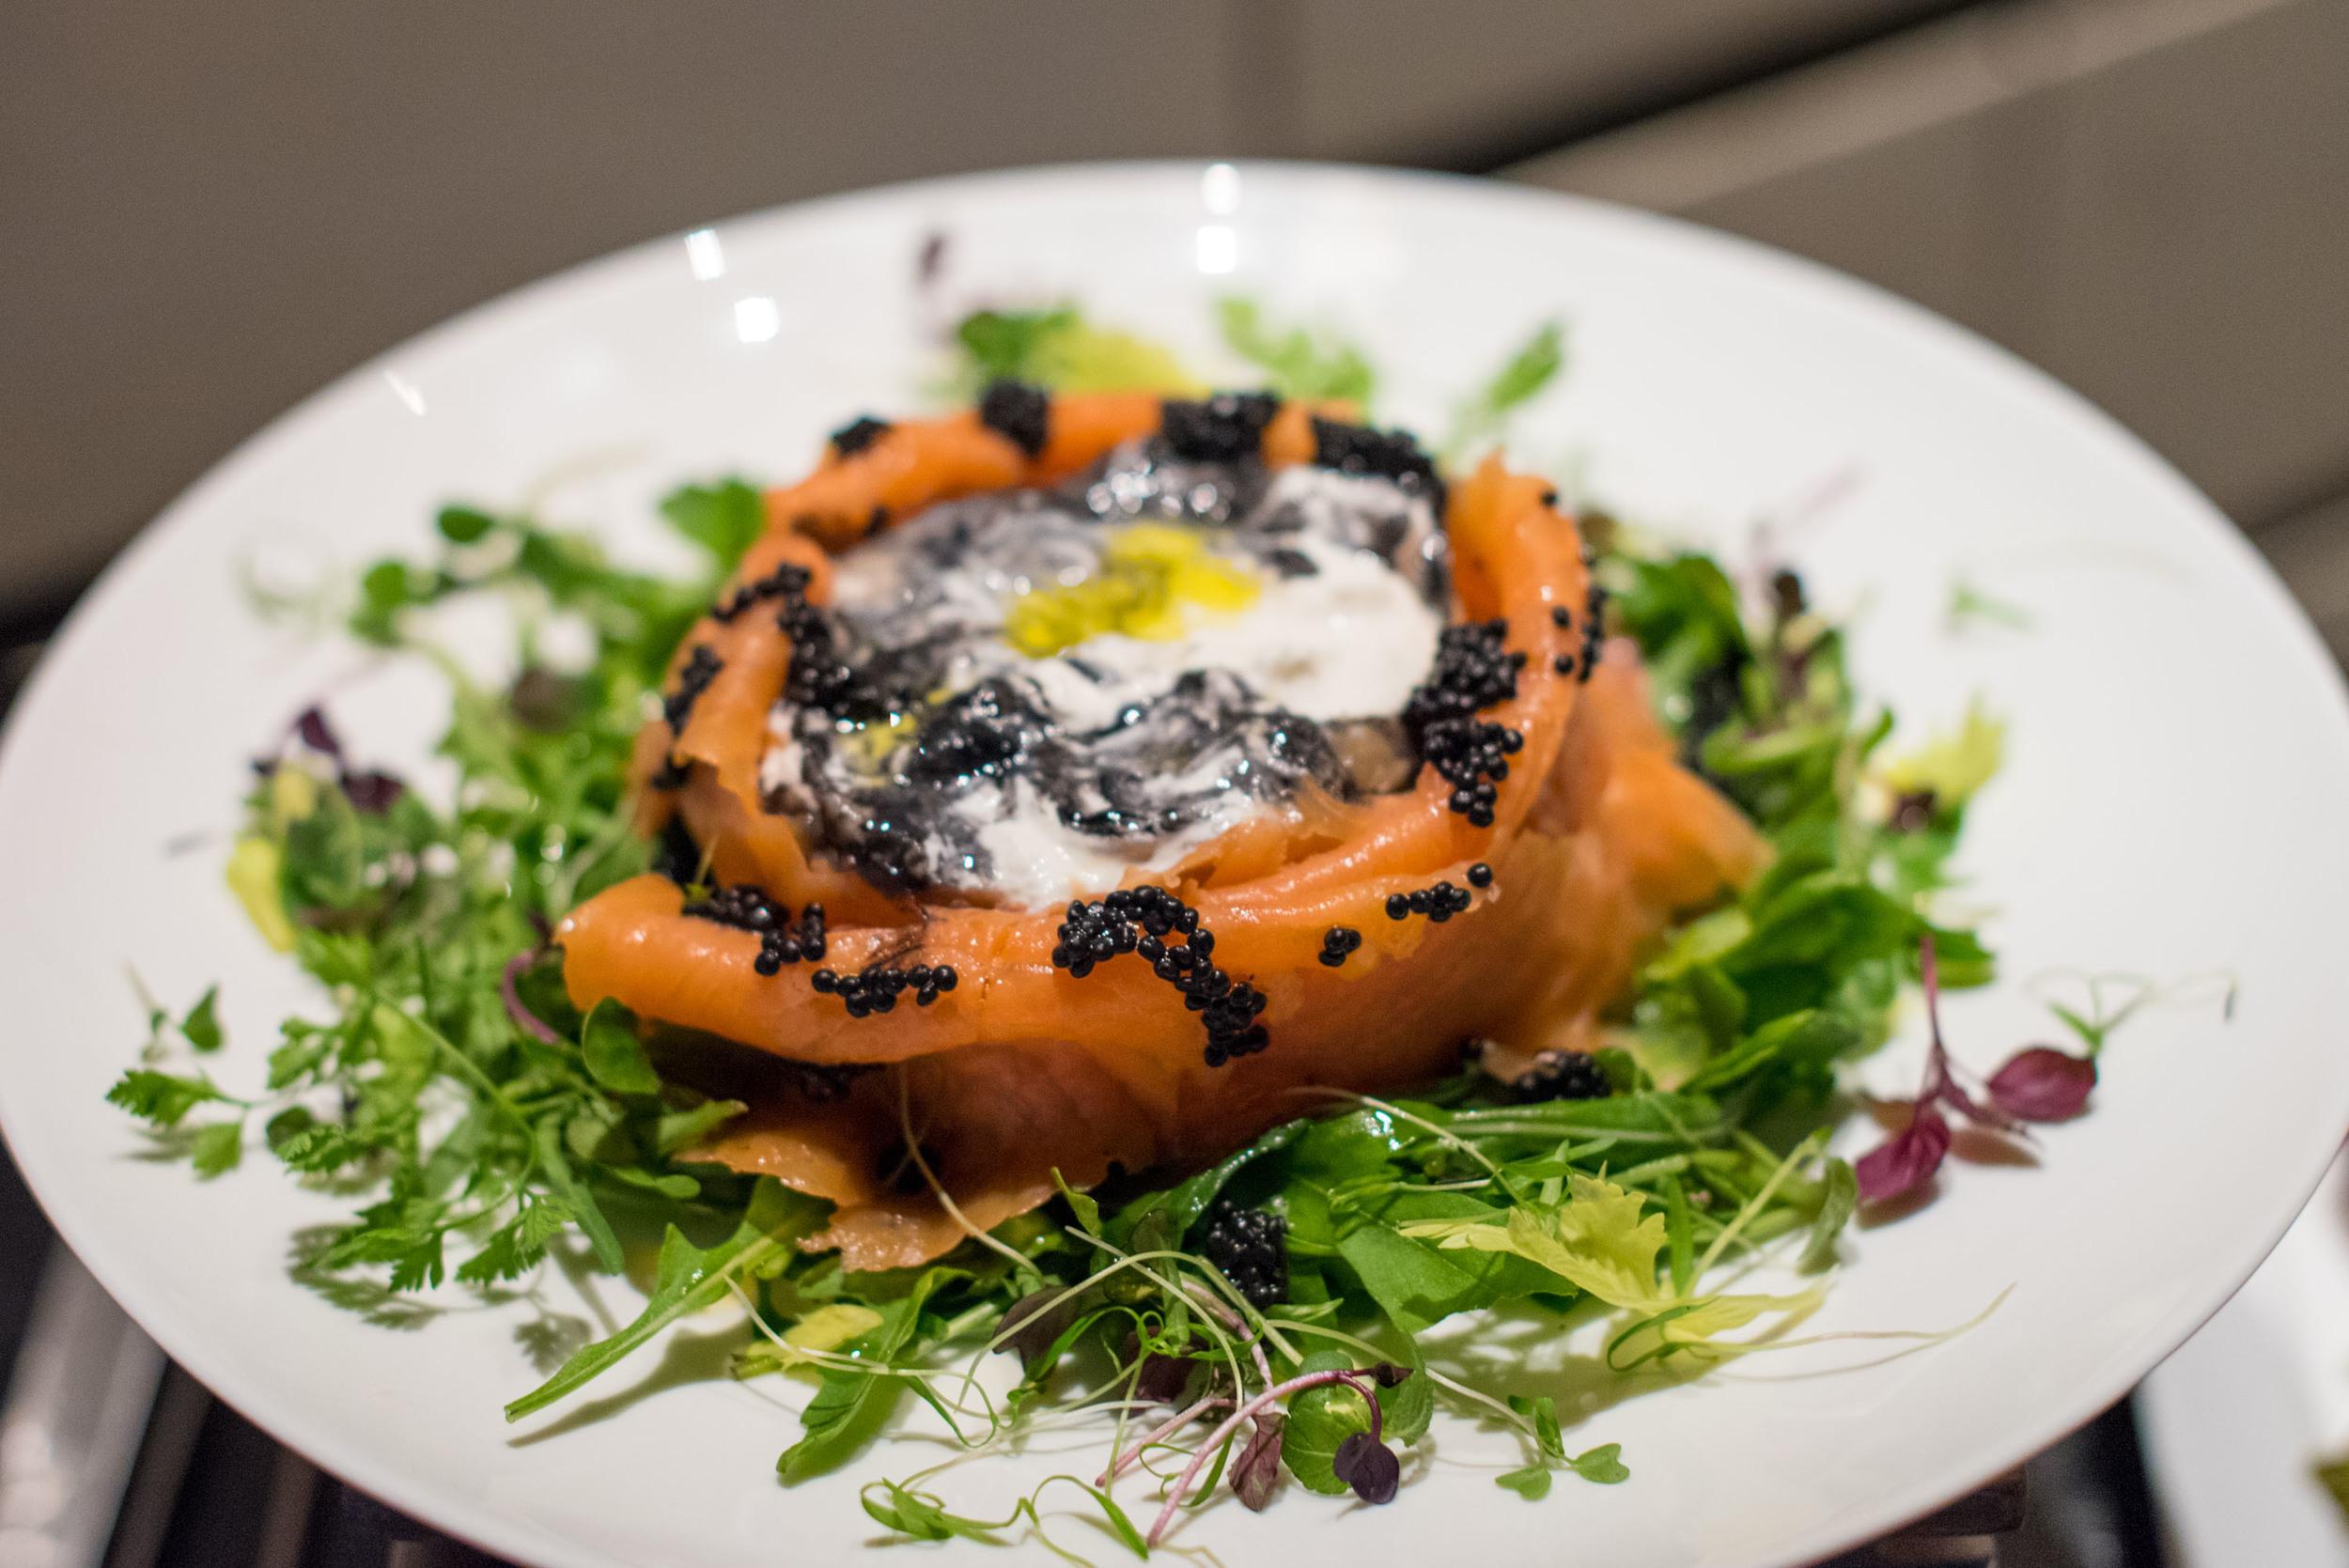 Squid Ink Burrata with Smoked Salmon and Caviar - 2016 Basilissimo  Basilico - Regent Singapore